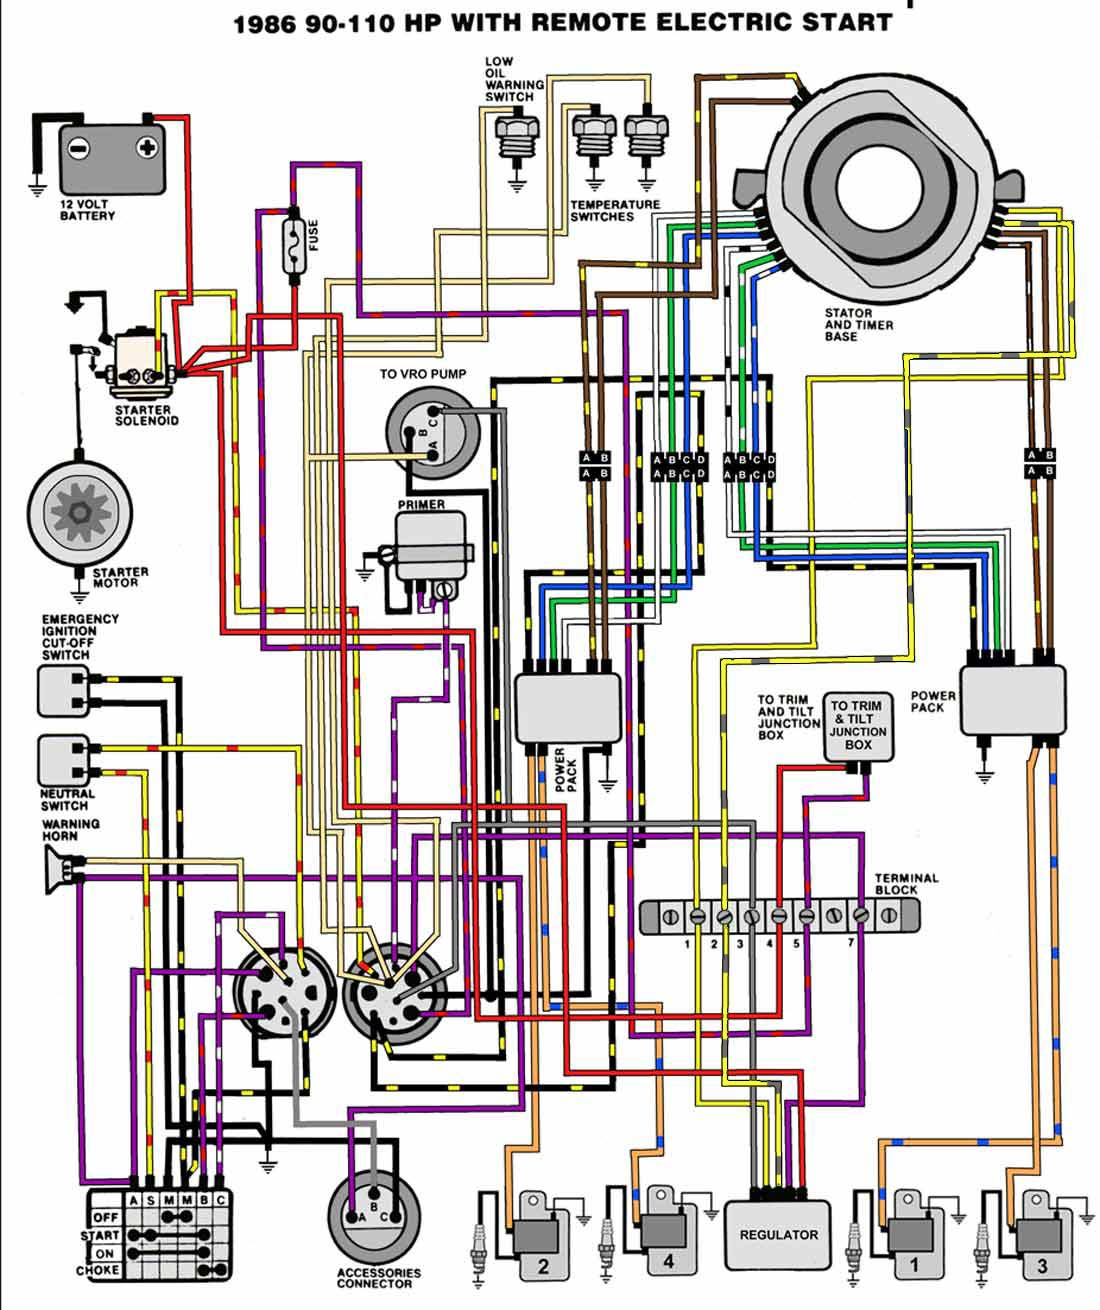 [QMVU_8575]  41F55 Force 90 Hp Wiring Diagram | Wiring Library | 1990 Mercury 150 Wiring Diagram |  | Wiring Library